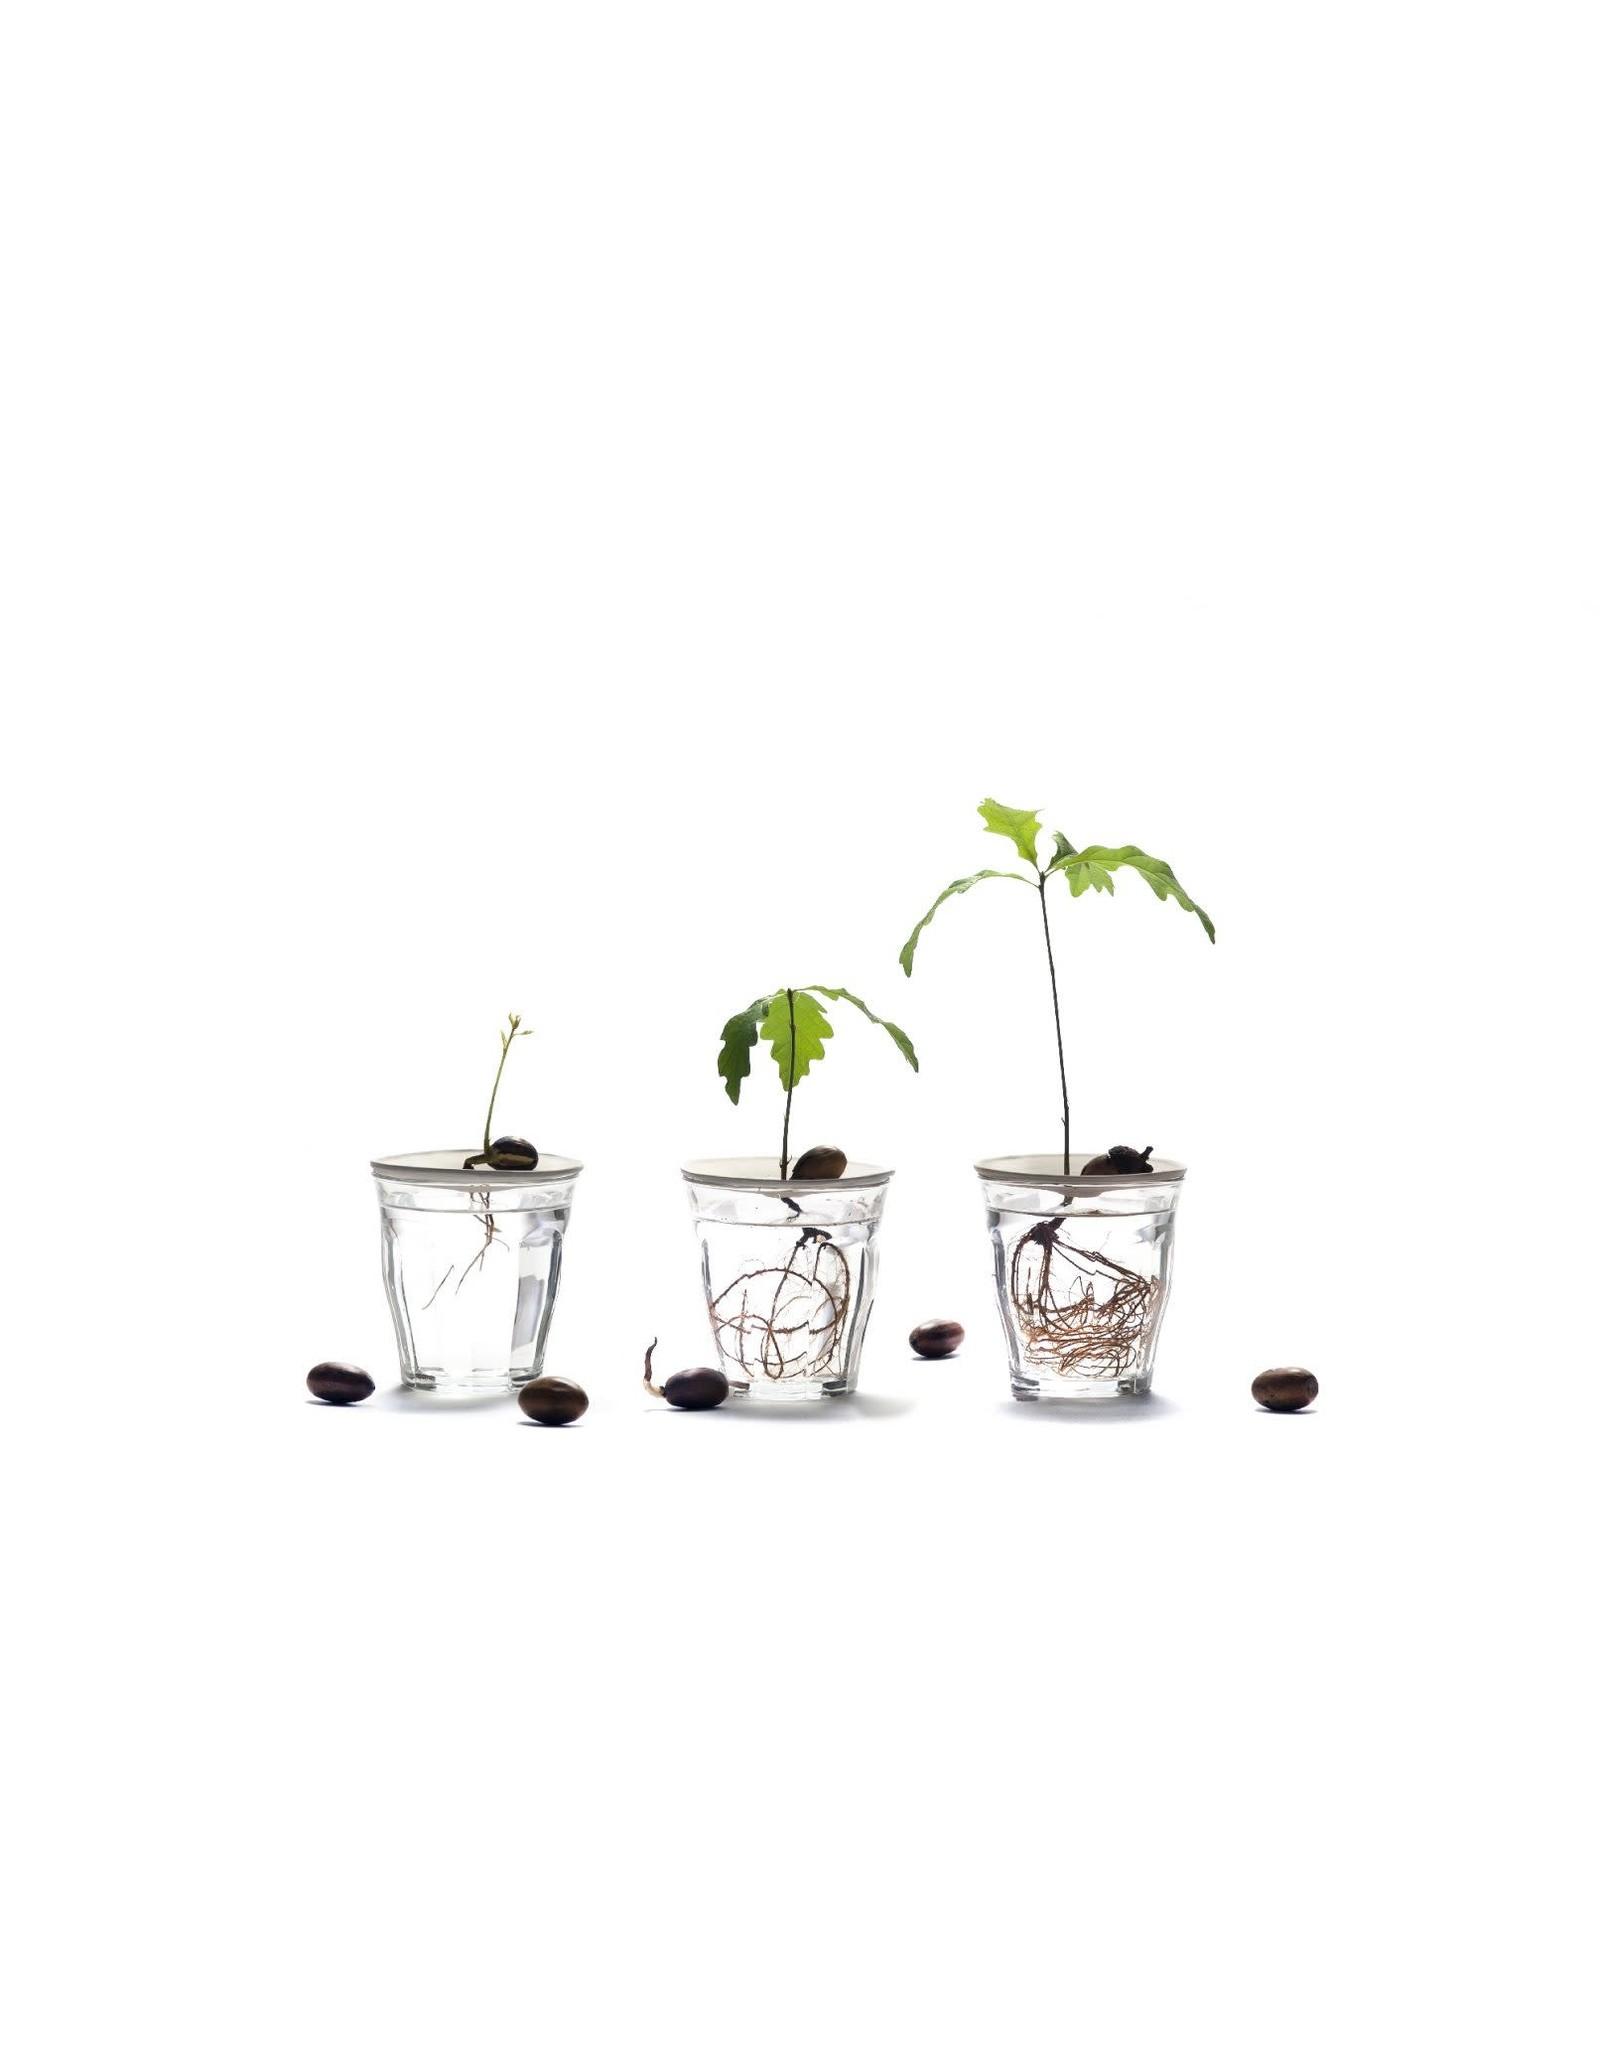 Botanopia Deluxe Germination & Propagation Gift Set